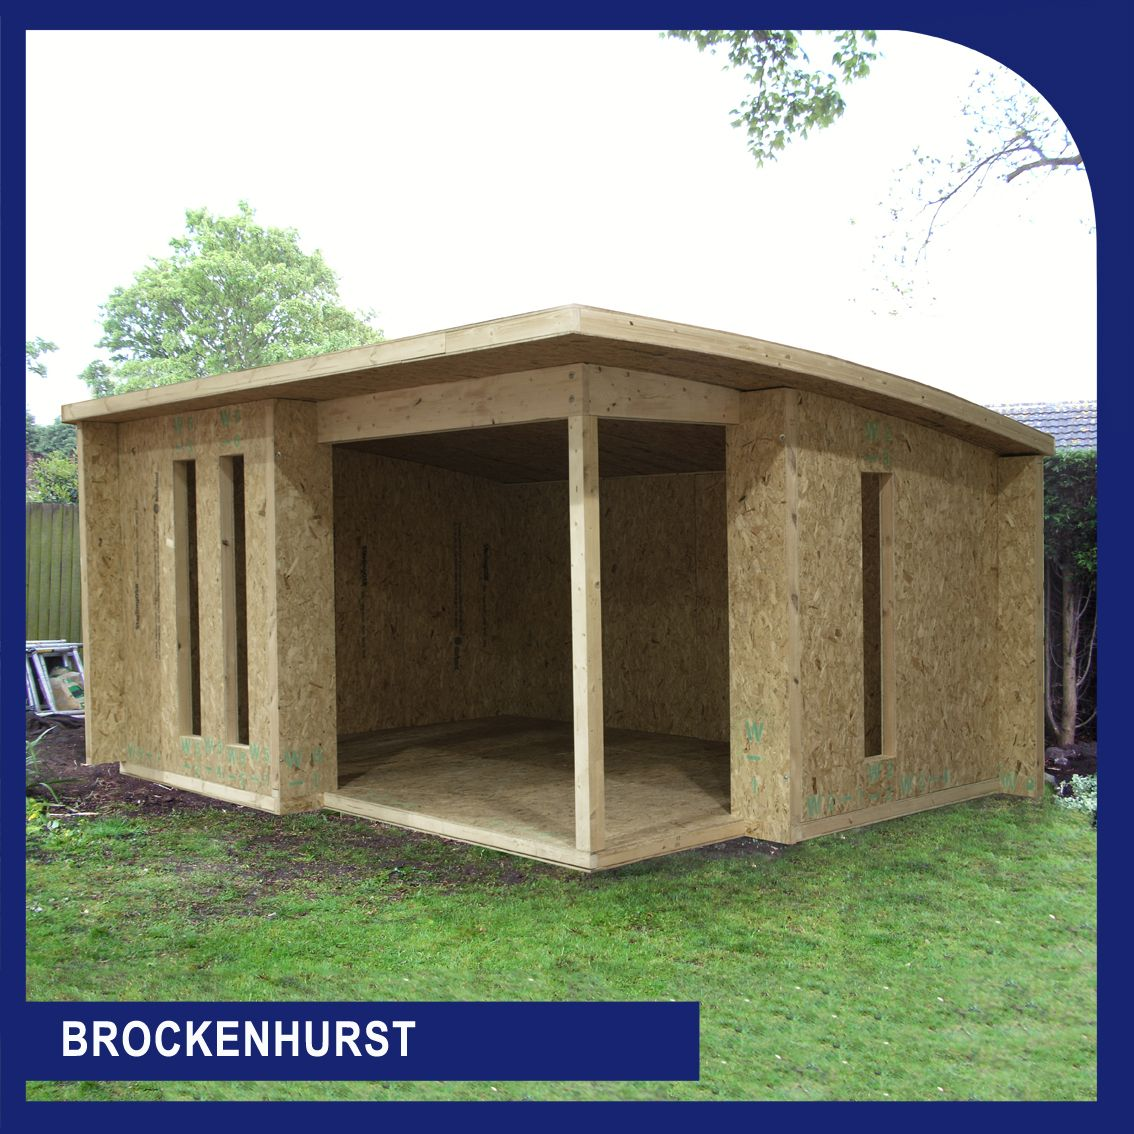 sips uk flat pack kits garden buildings annexs building annex self build annex structural panels. Black Bedroom Furniture Sets. Home Design Ideas